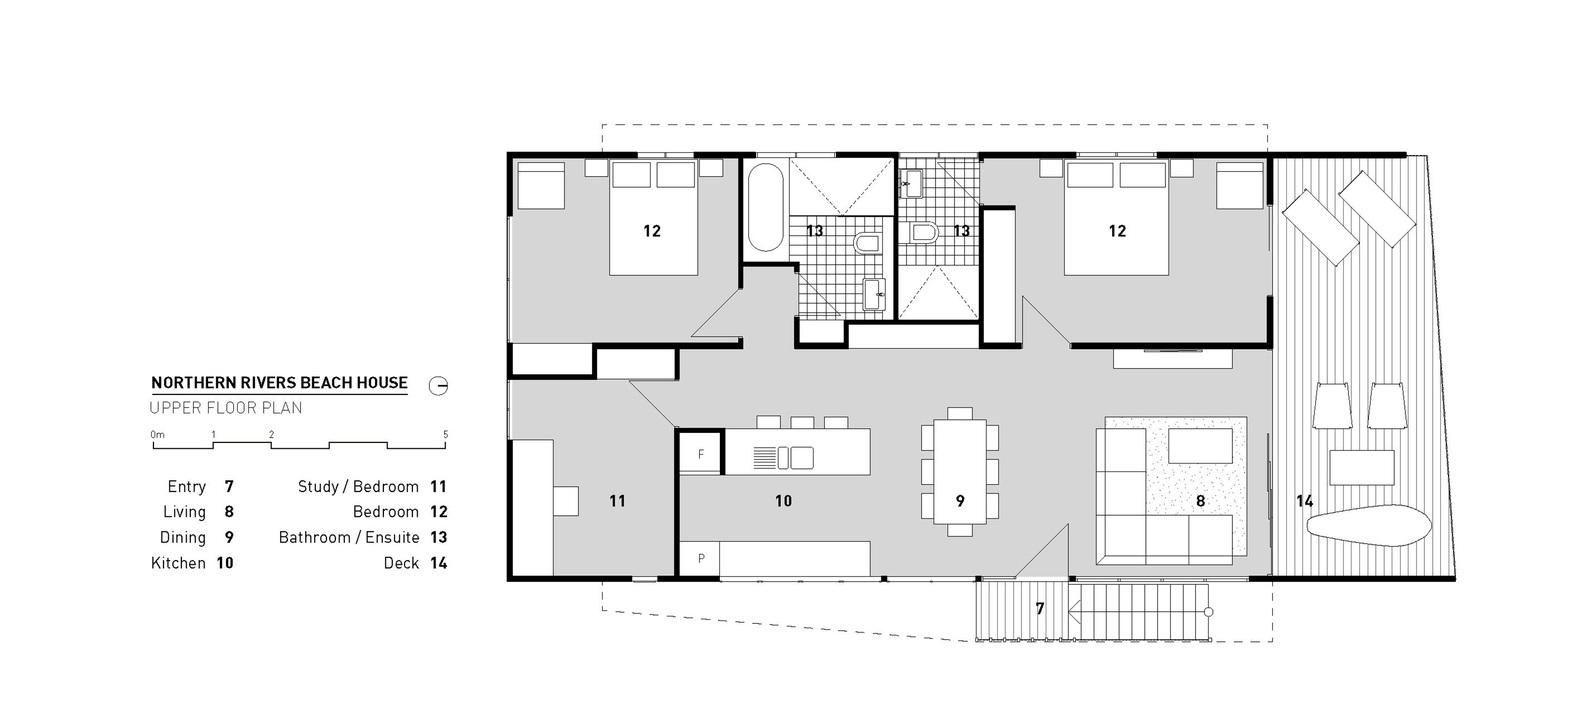 Northern Rivers Beach House,Upper Floor Plan